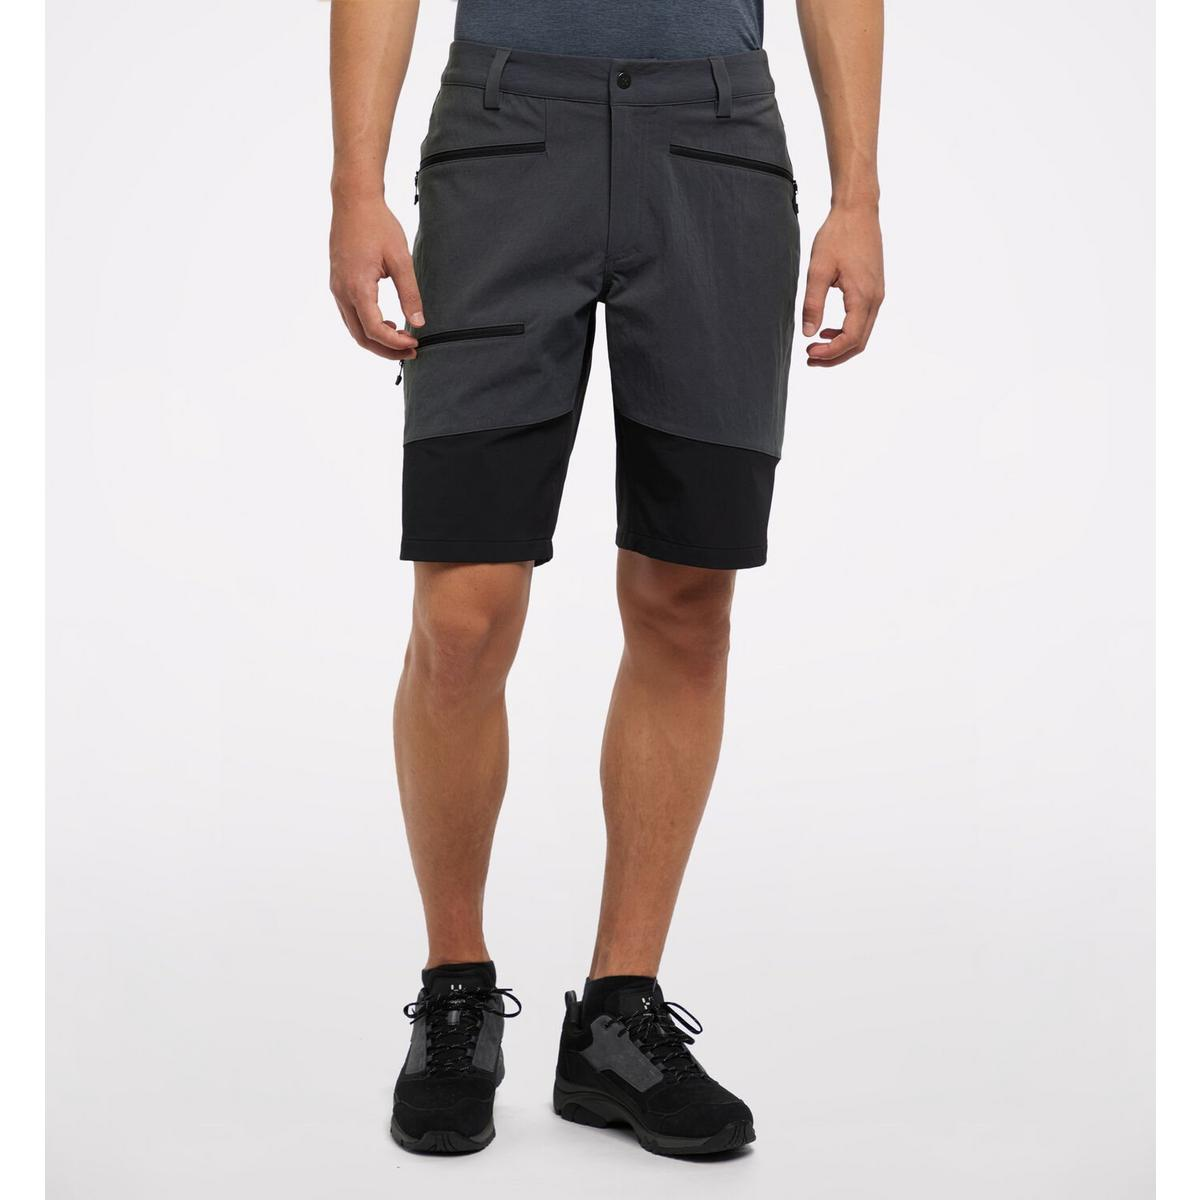 Haglofs Men's Rugged Flex Shorts - Grey